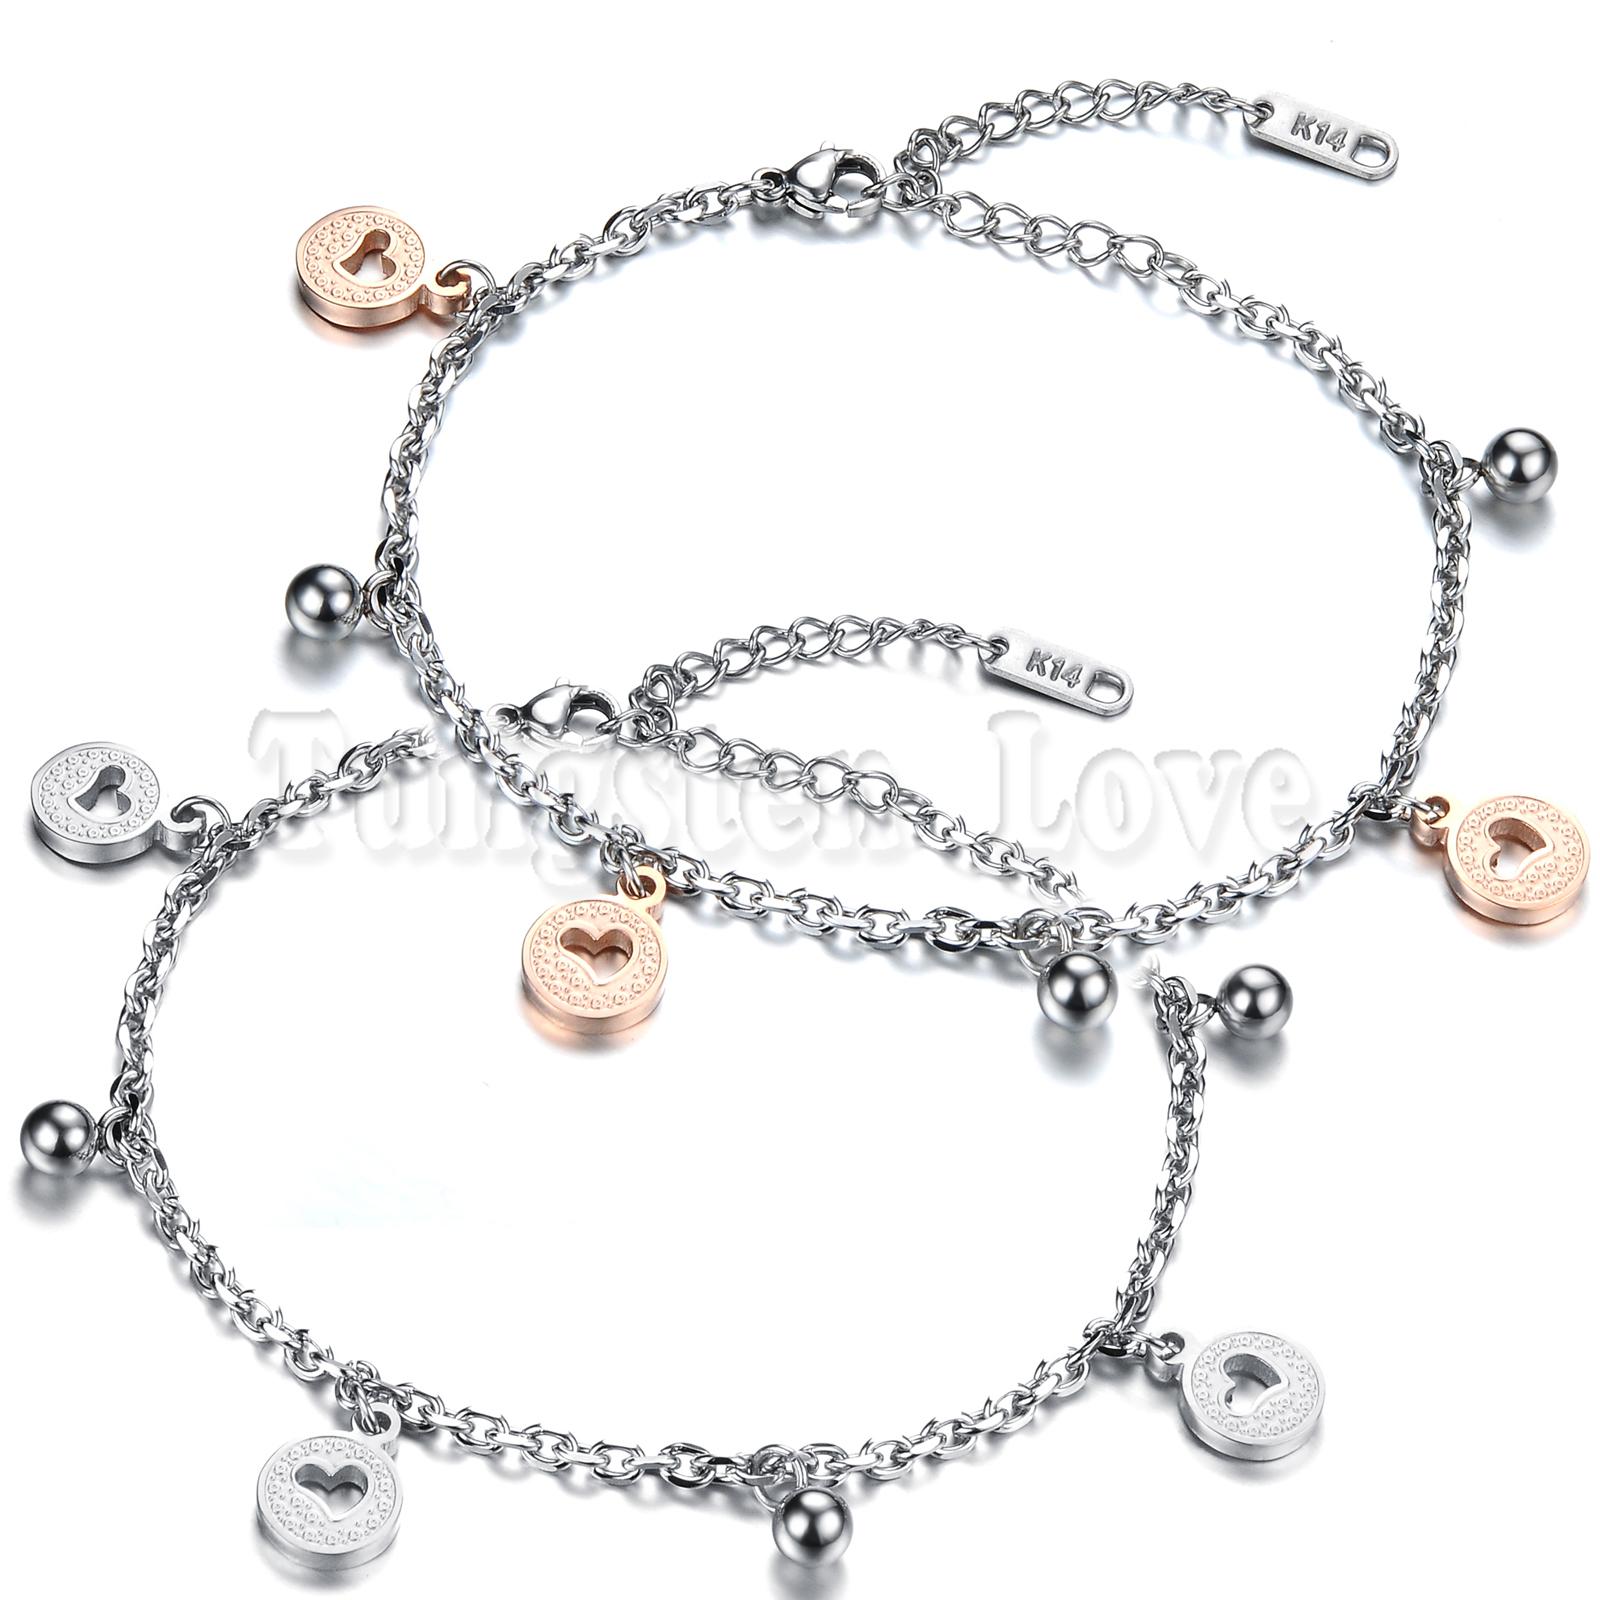 Fashion Pulseras Silver Rose Gold Heart Beads Bracelet Charm Bracelets for Women Bracelets & Bangles pulseira feminina(China (Mainland))